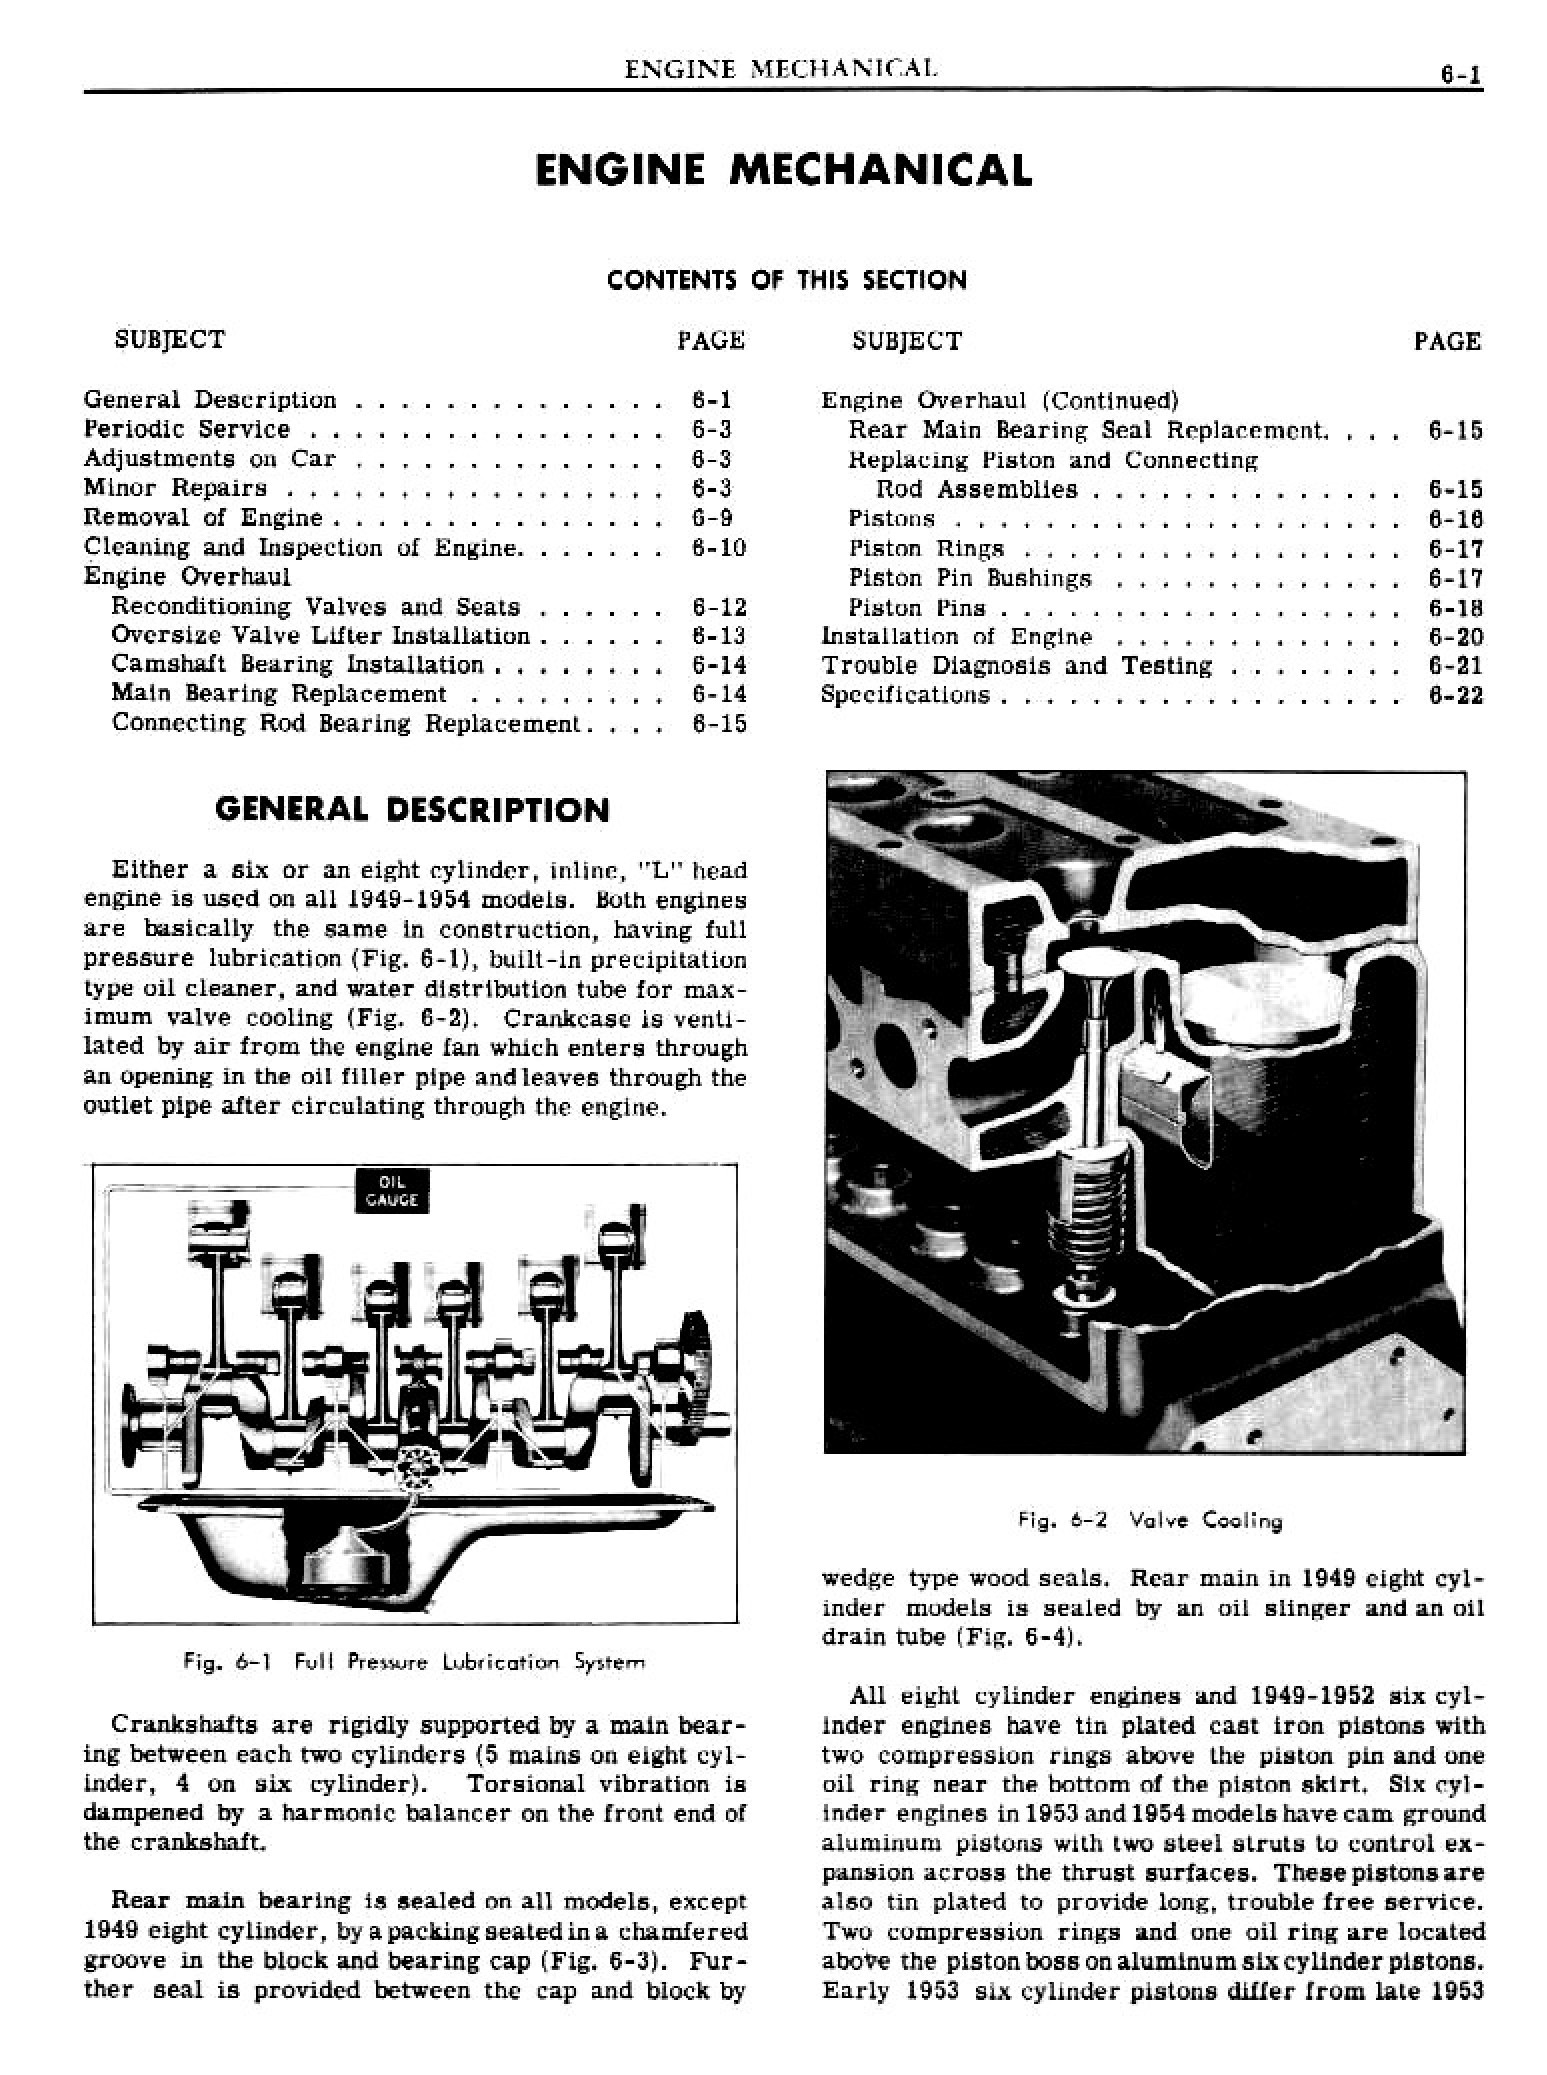 1949 Pontiac Shop Manual- Engine Mechanical Page 1 of 26